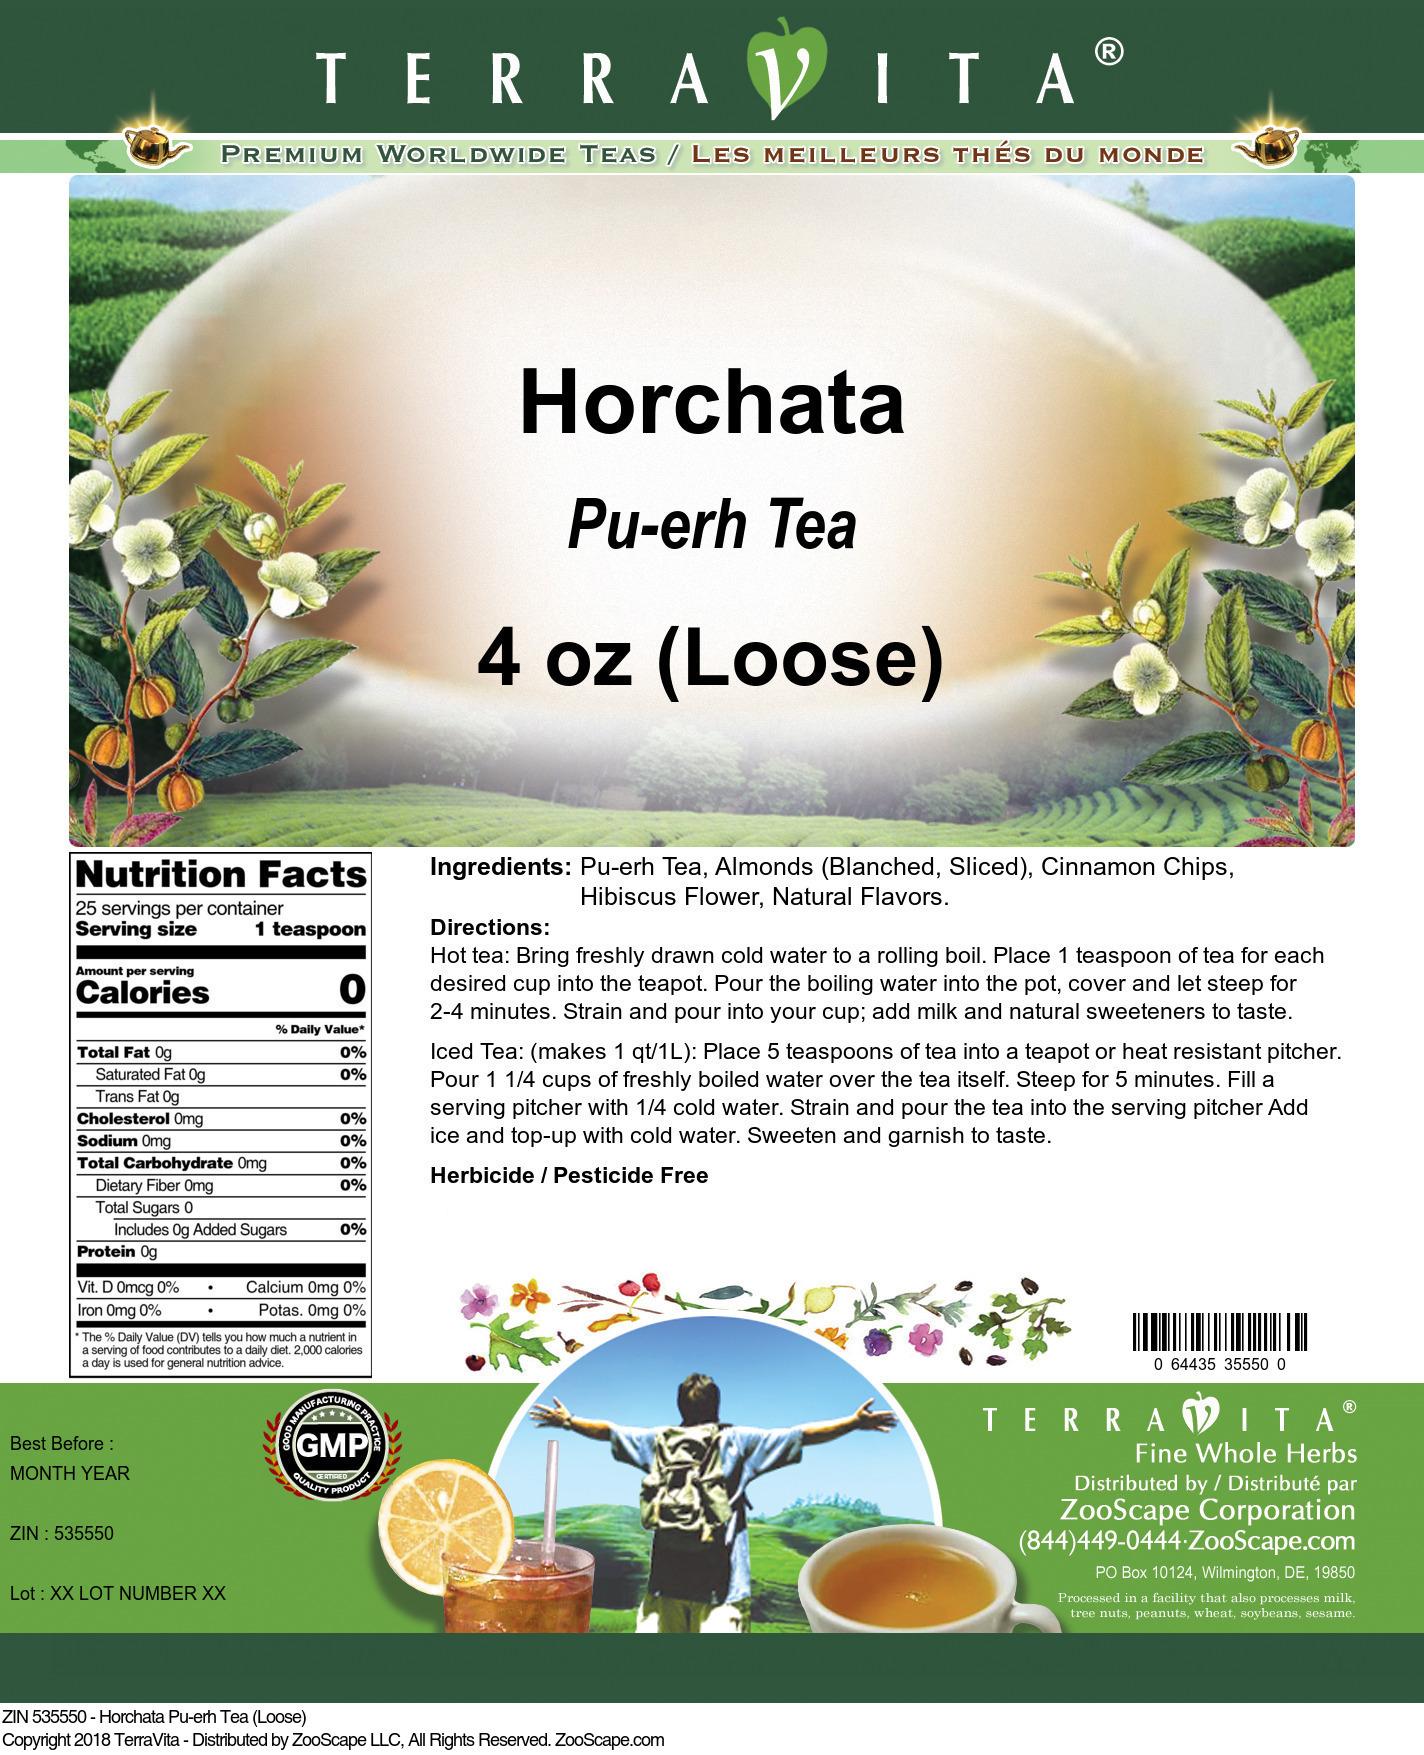 Horchata Pu-erh Tea